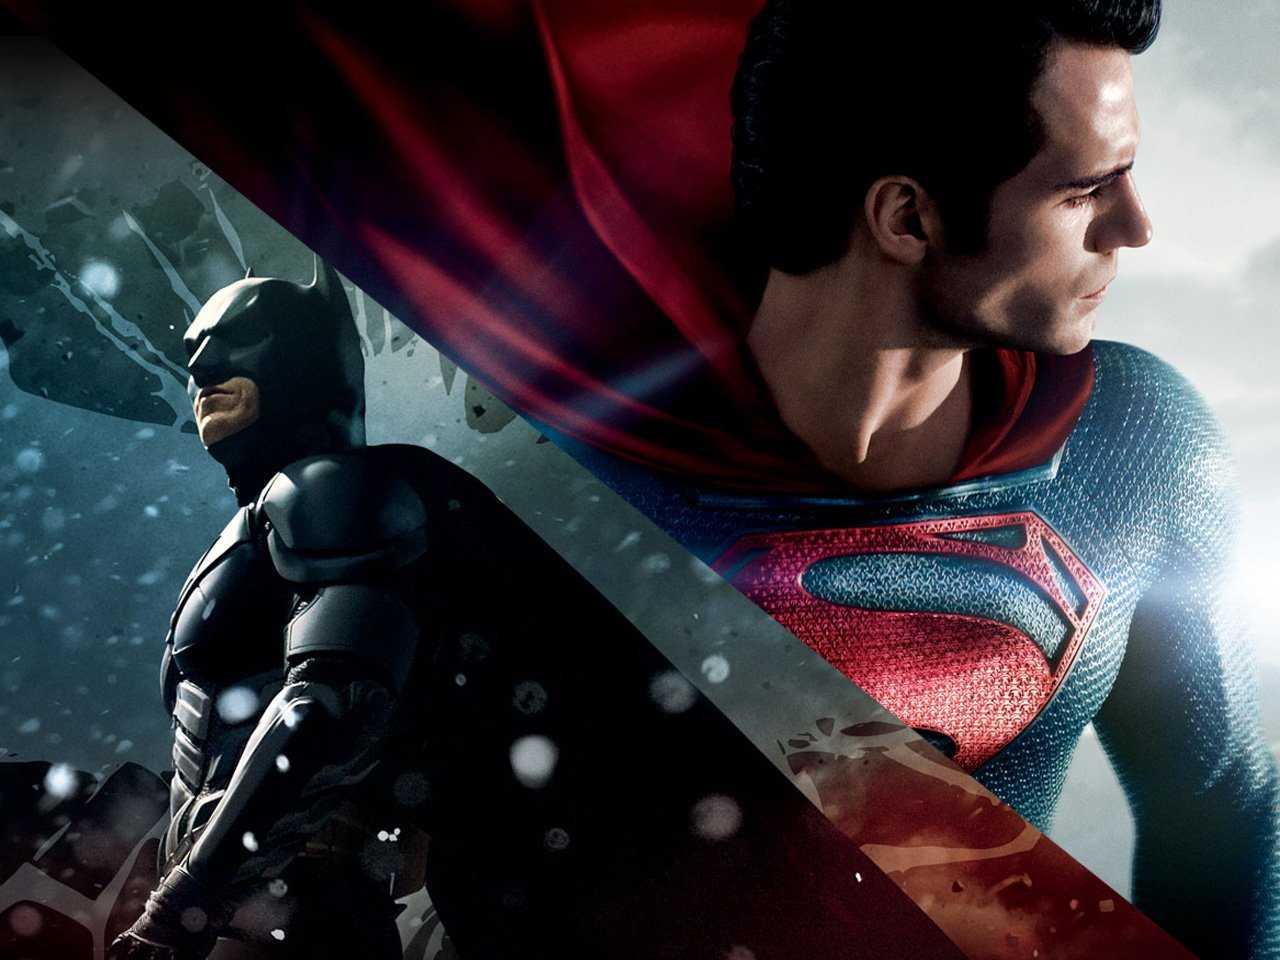 the-big-batman-vs-superman-movie-is-delayed-until-2016